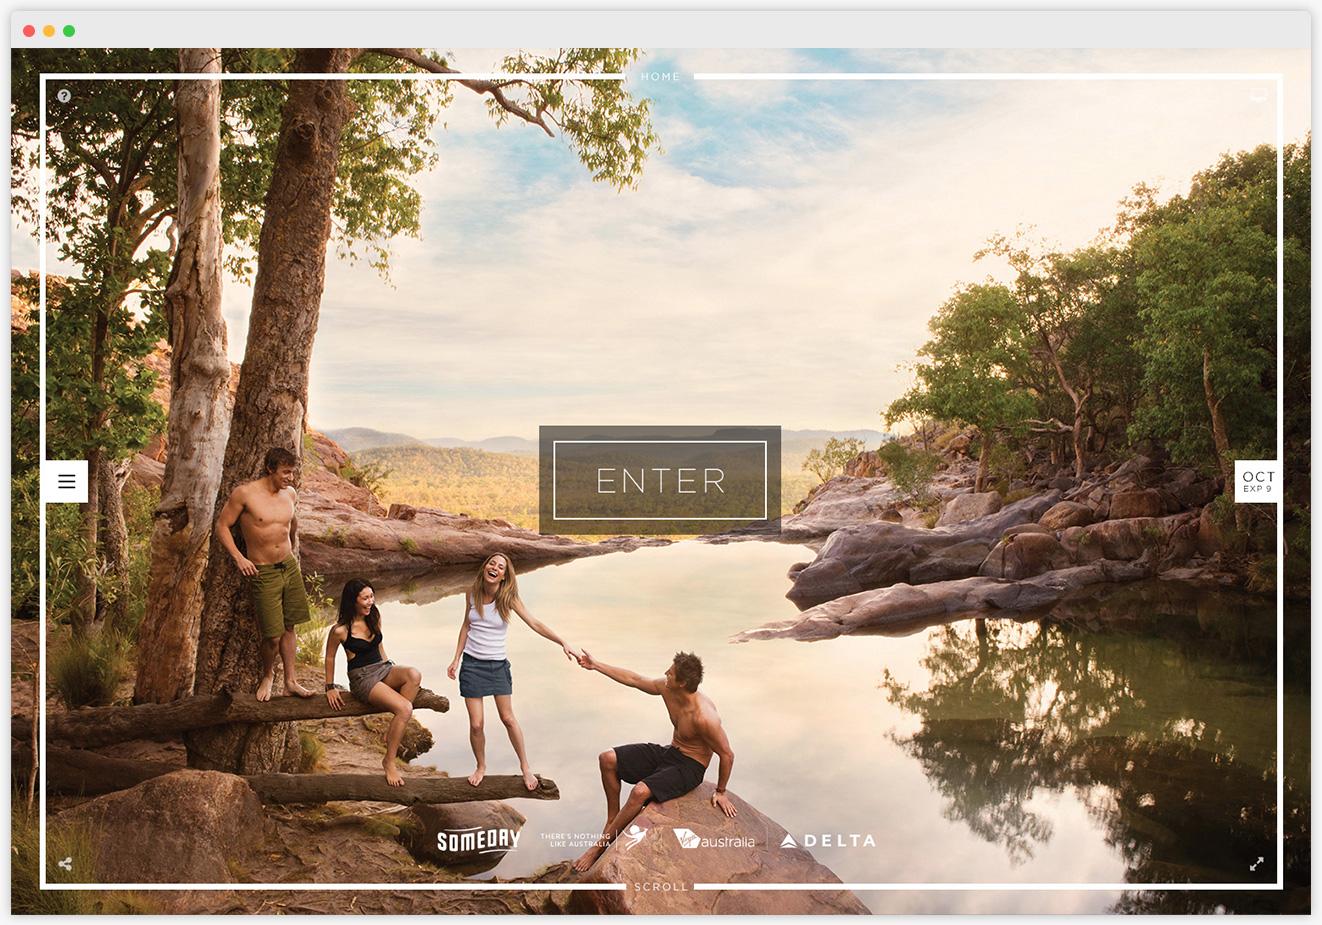 someday-website-desktop5.jpg